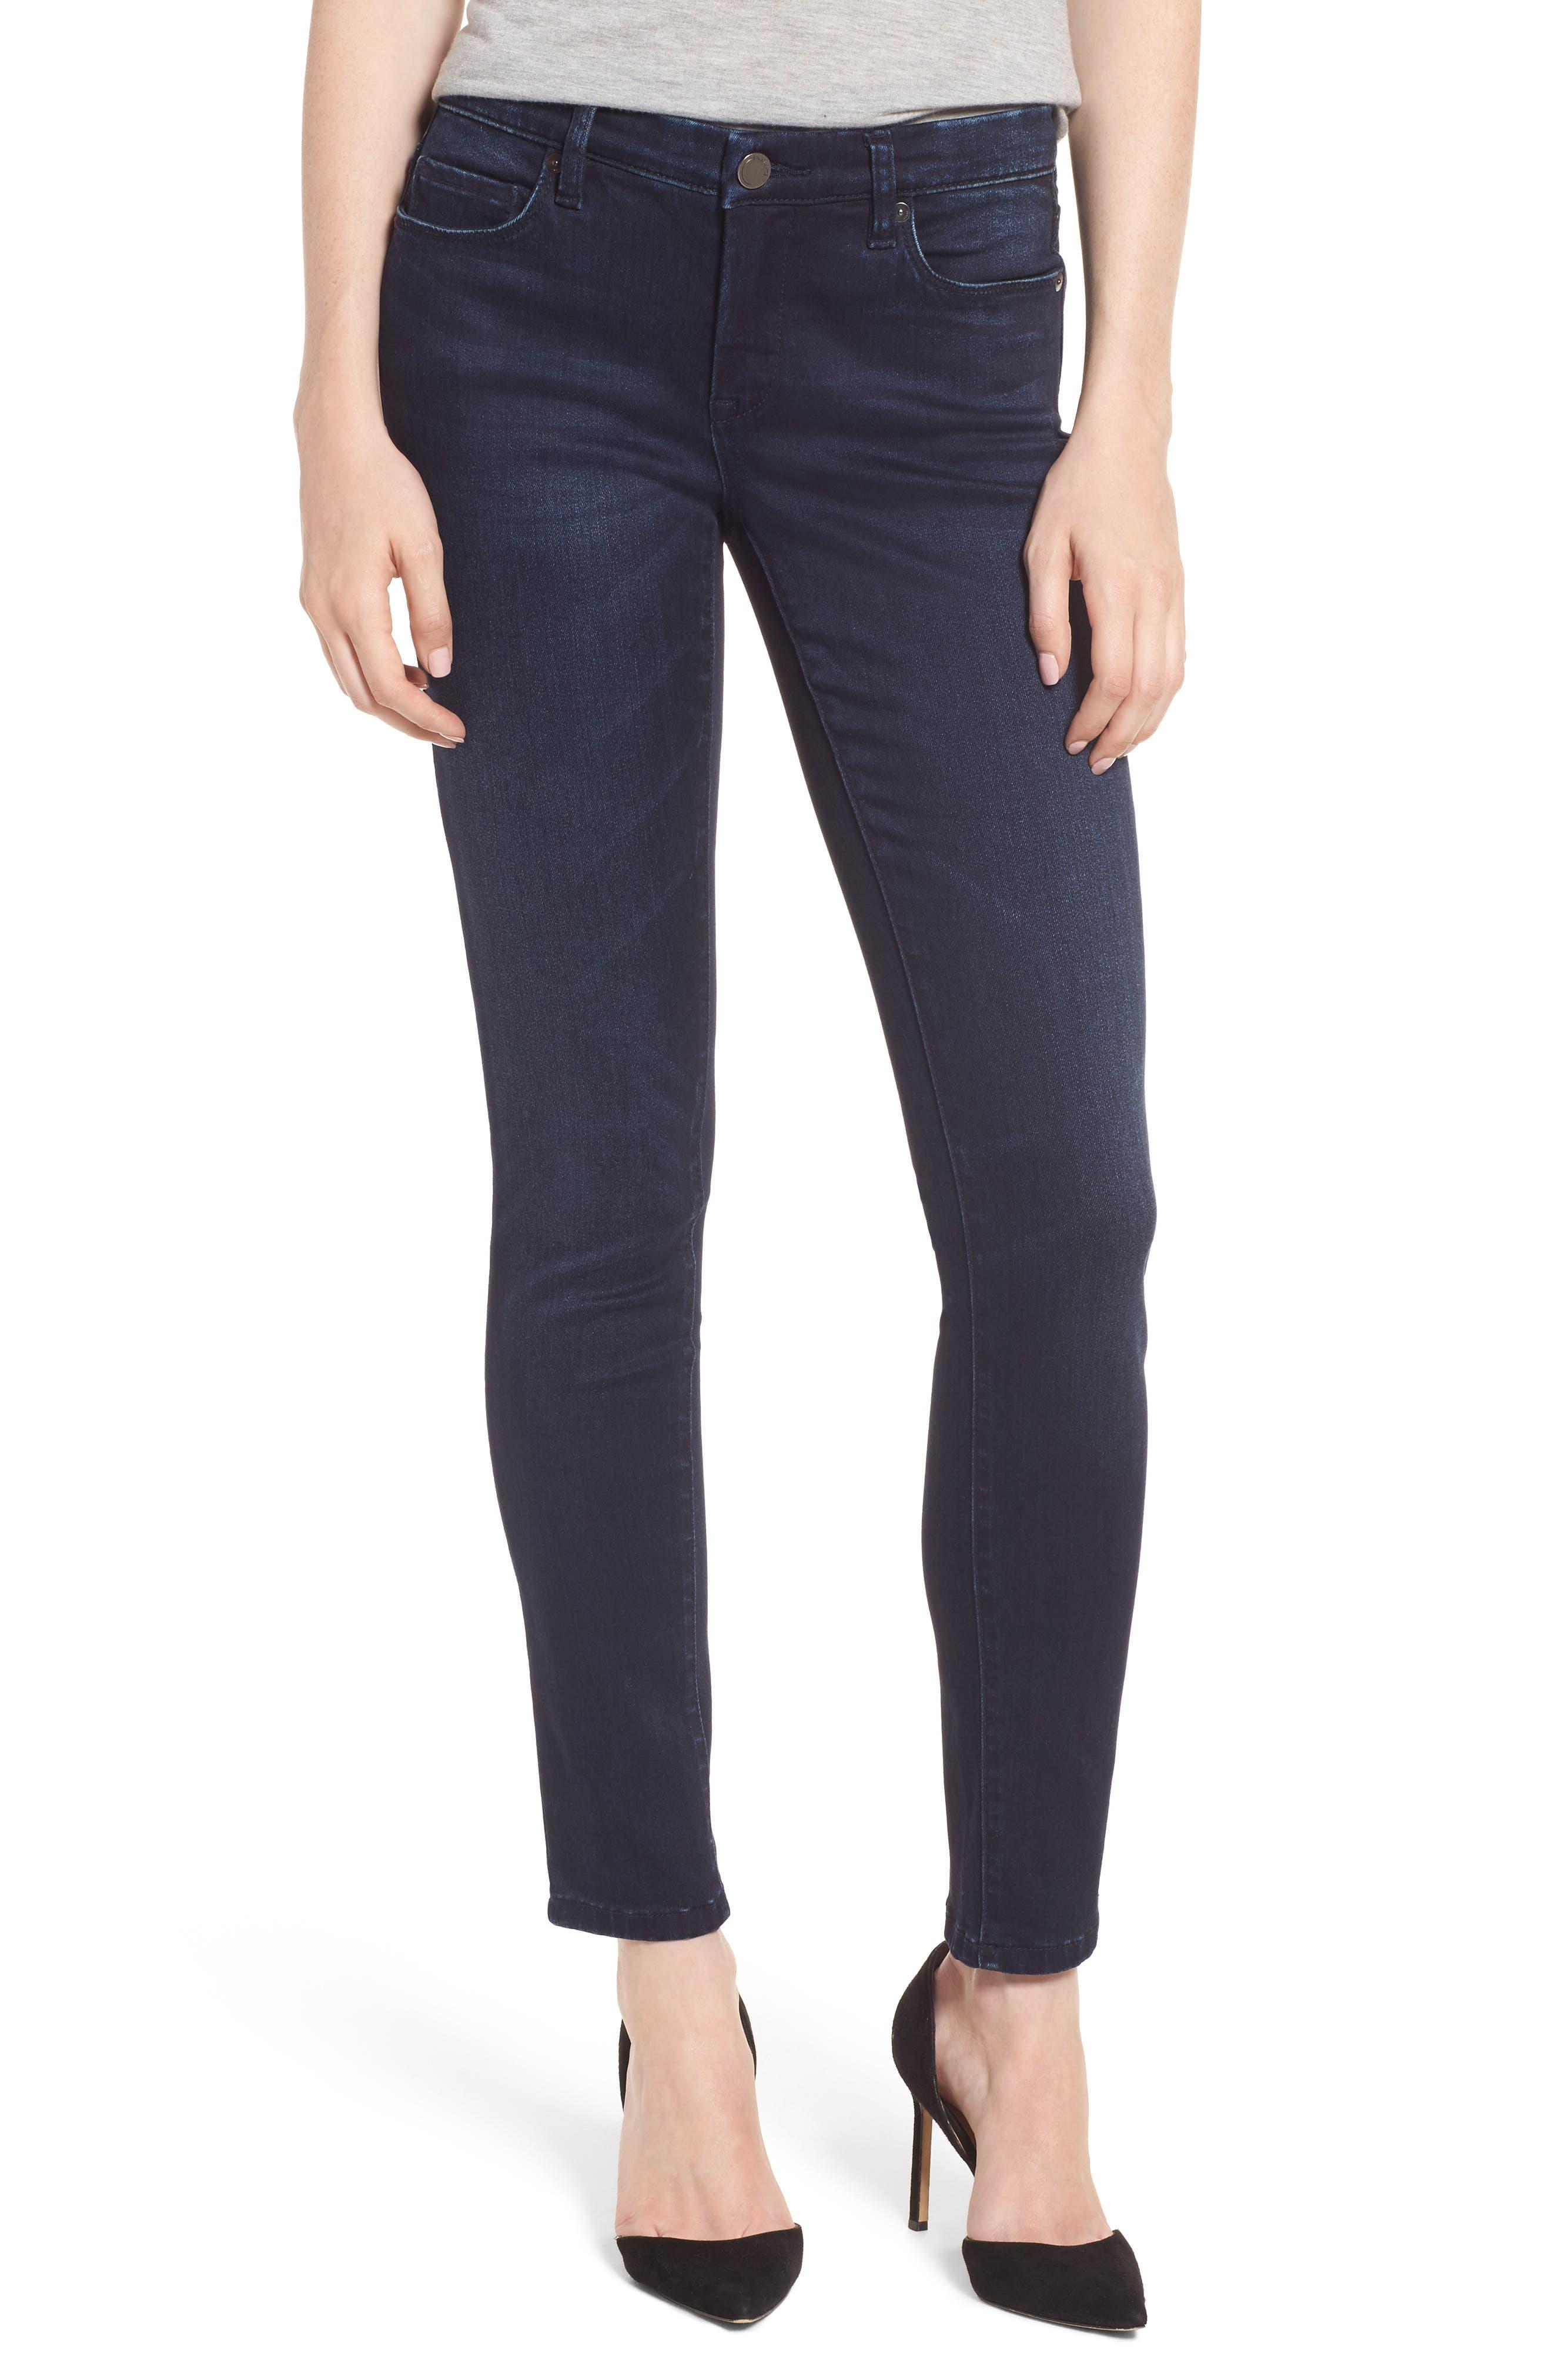 Main Image - BLANKNYC Stretch Skinny Jeans (Junk Brain)